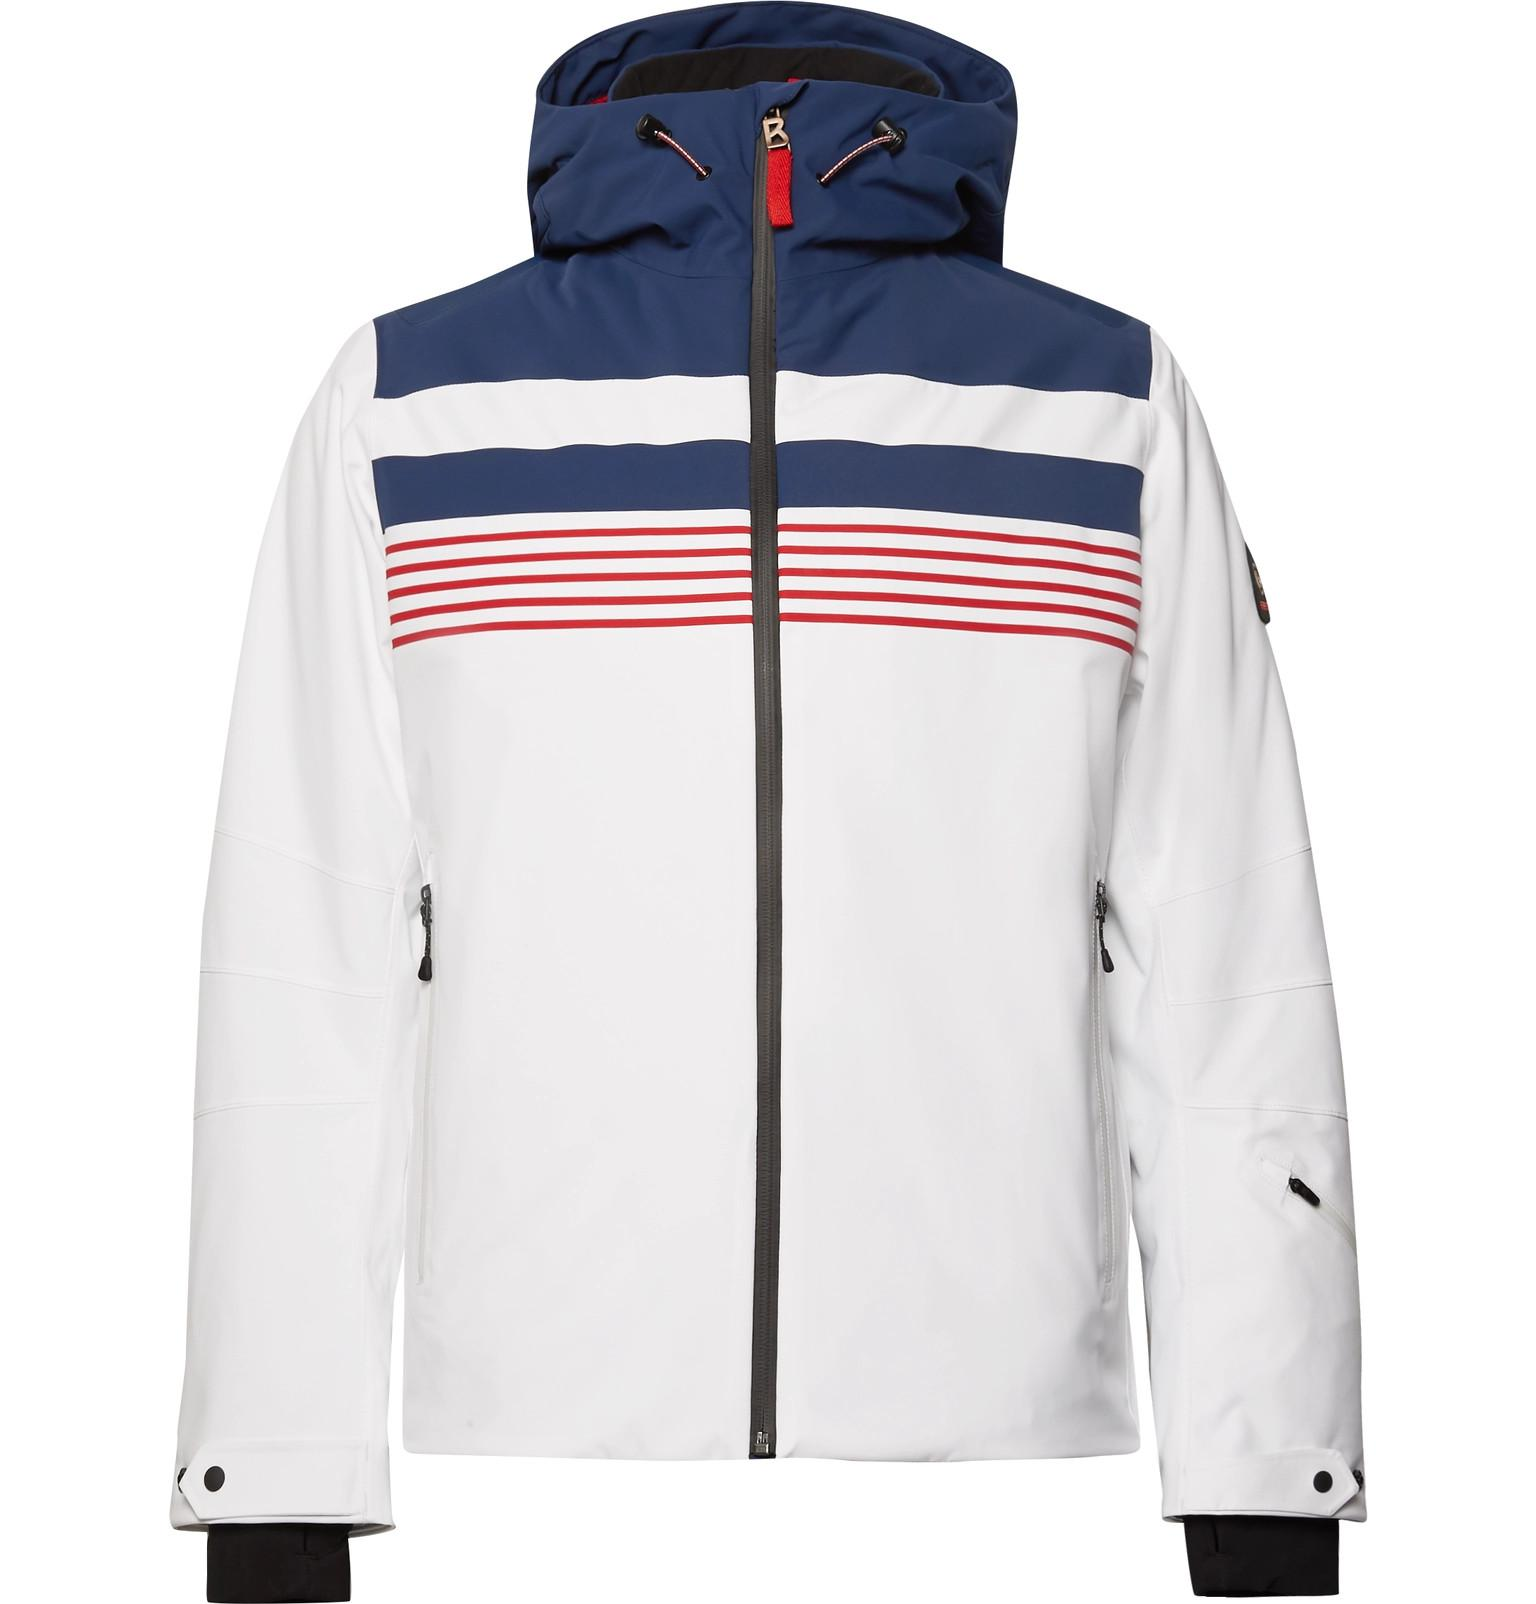 Lyst - Bogner - Fire Ice Mendo Striped Ski Jacket - White in White ... 1606c61f7